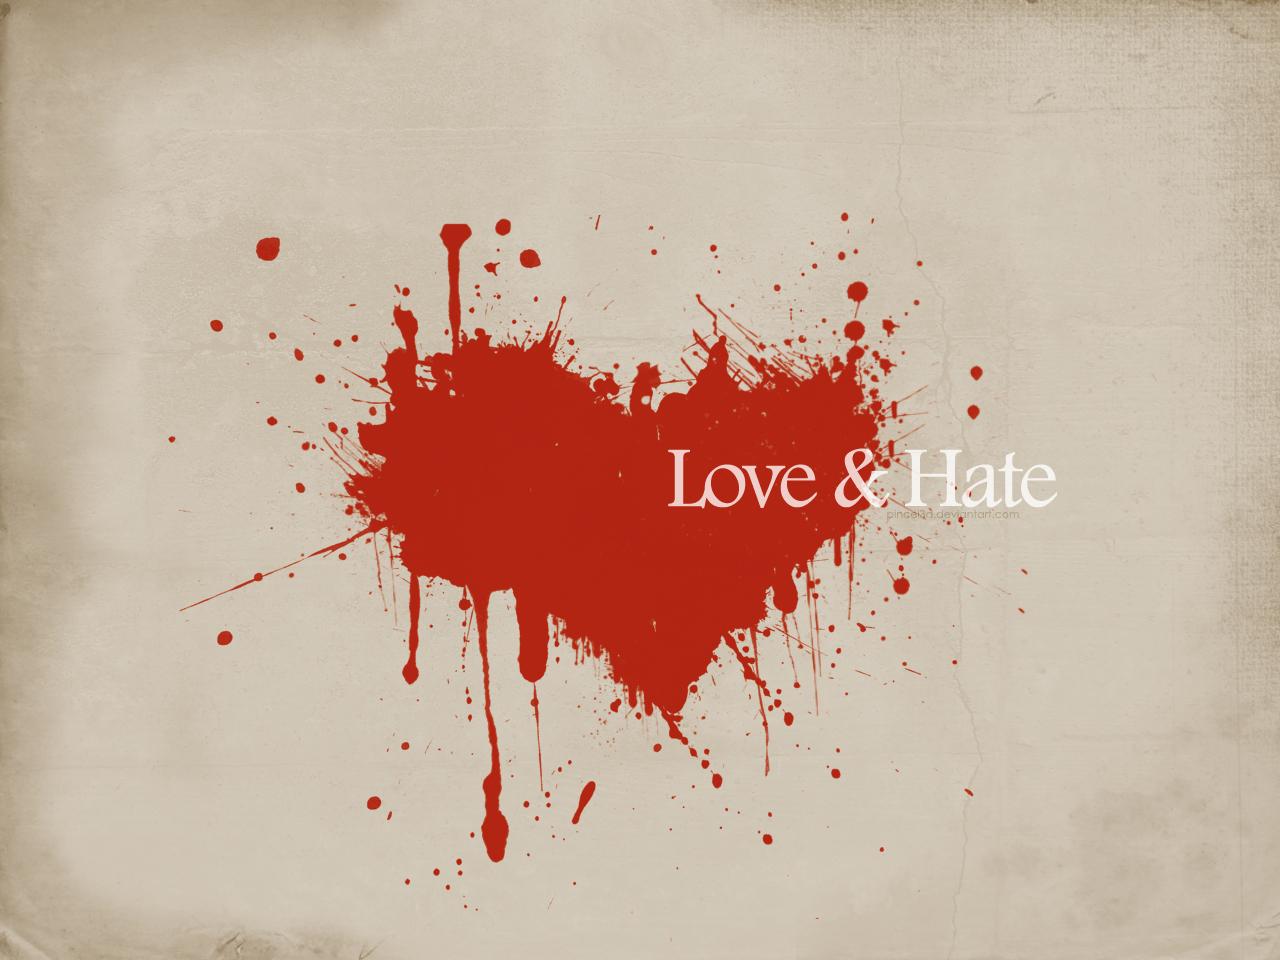 Love hate